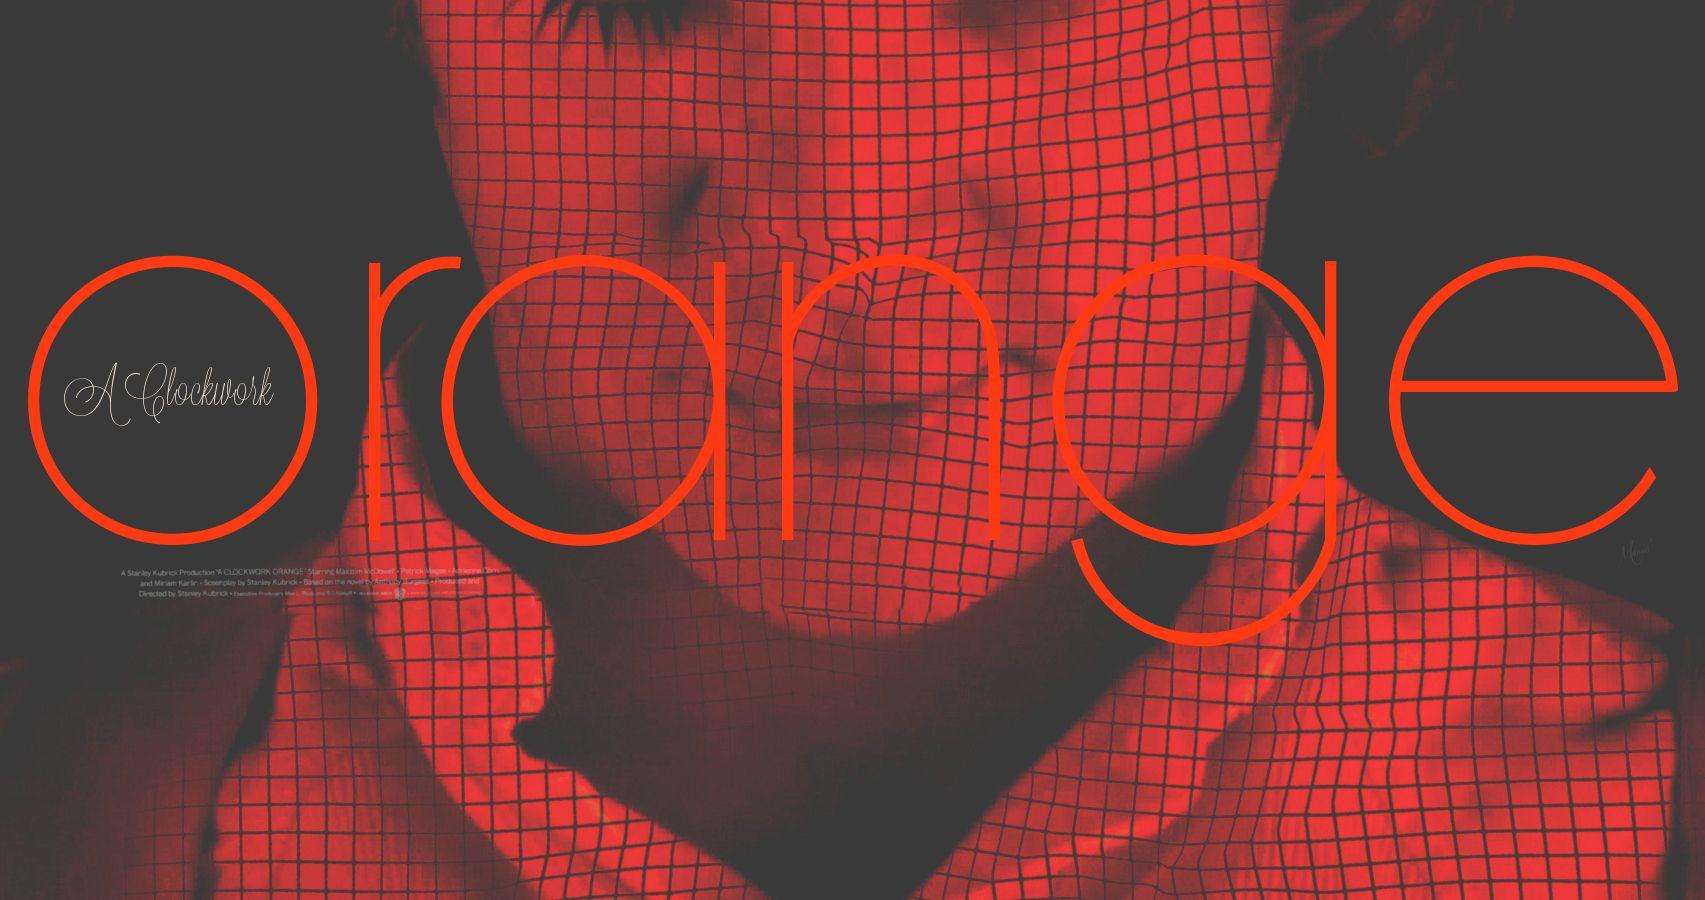 clock work design graphic - Buscar con Google